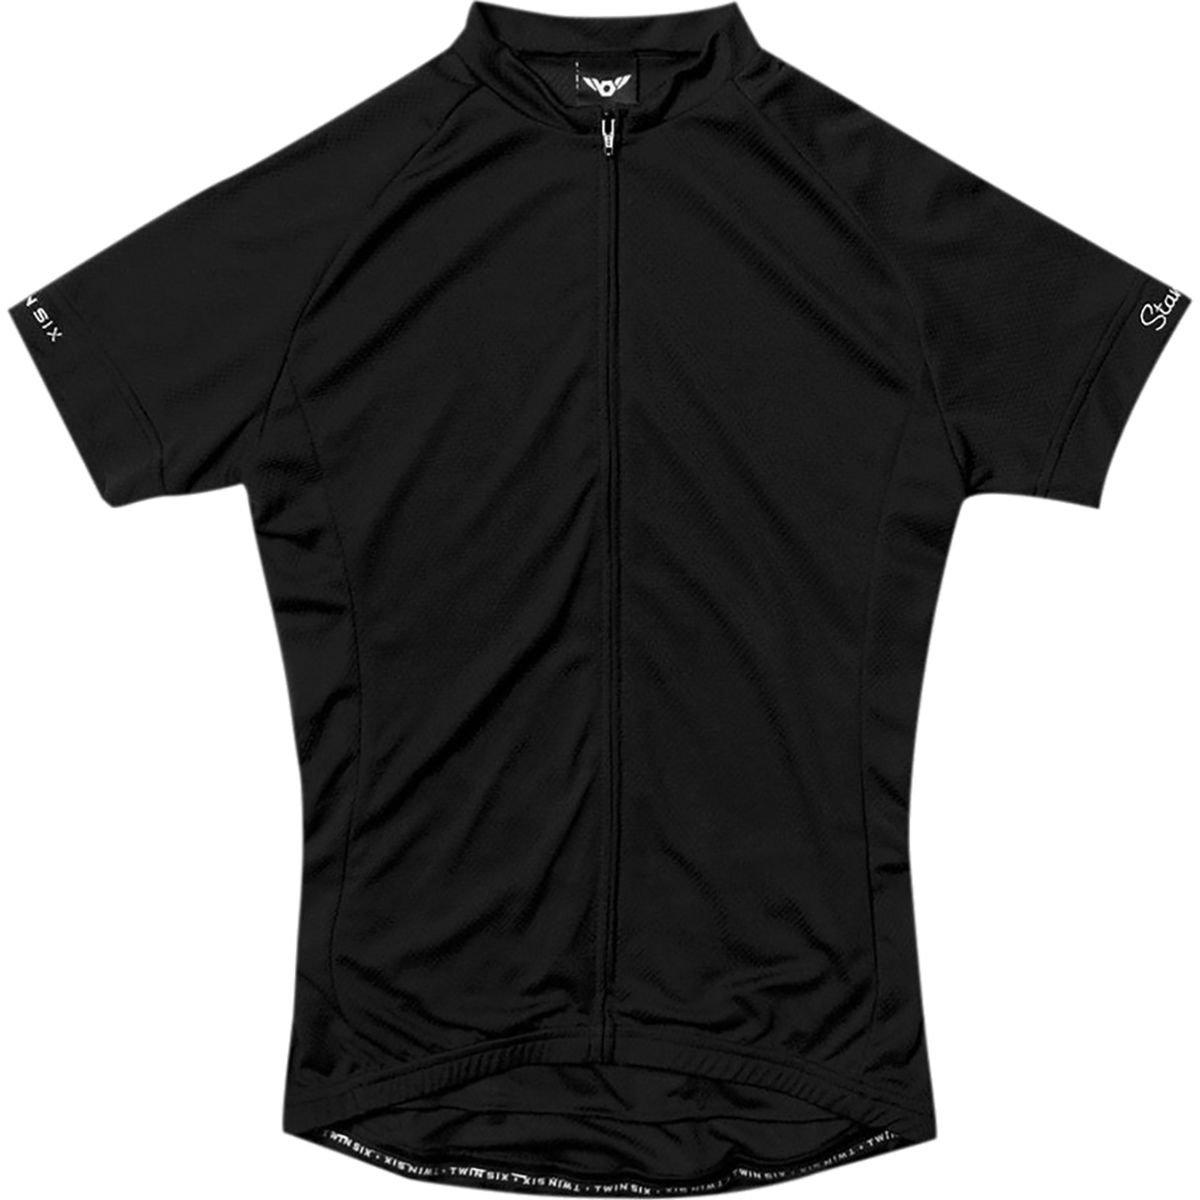 Twin Six Standard半袖Jersey – Men 's B0187MGPWO X-Large ブラック ブラック X-Large